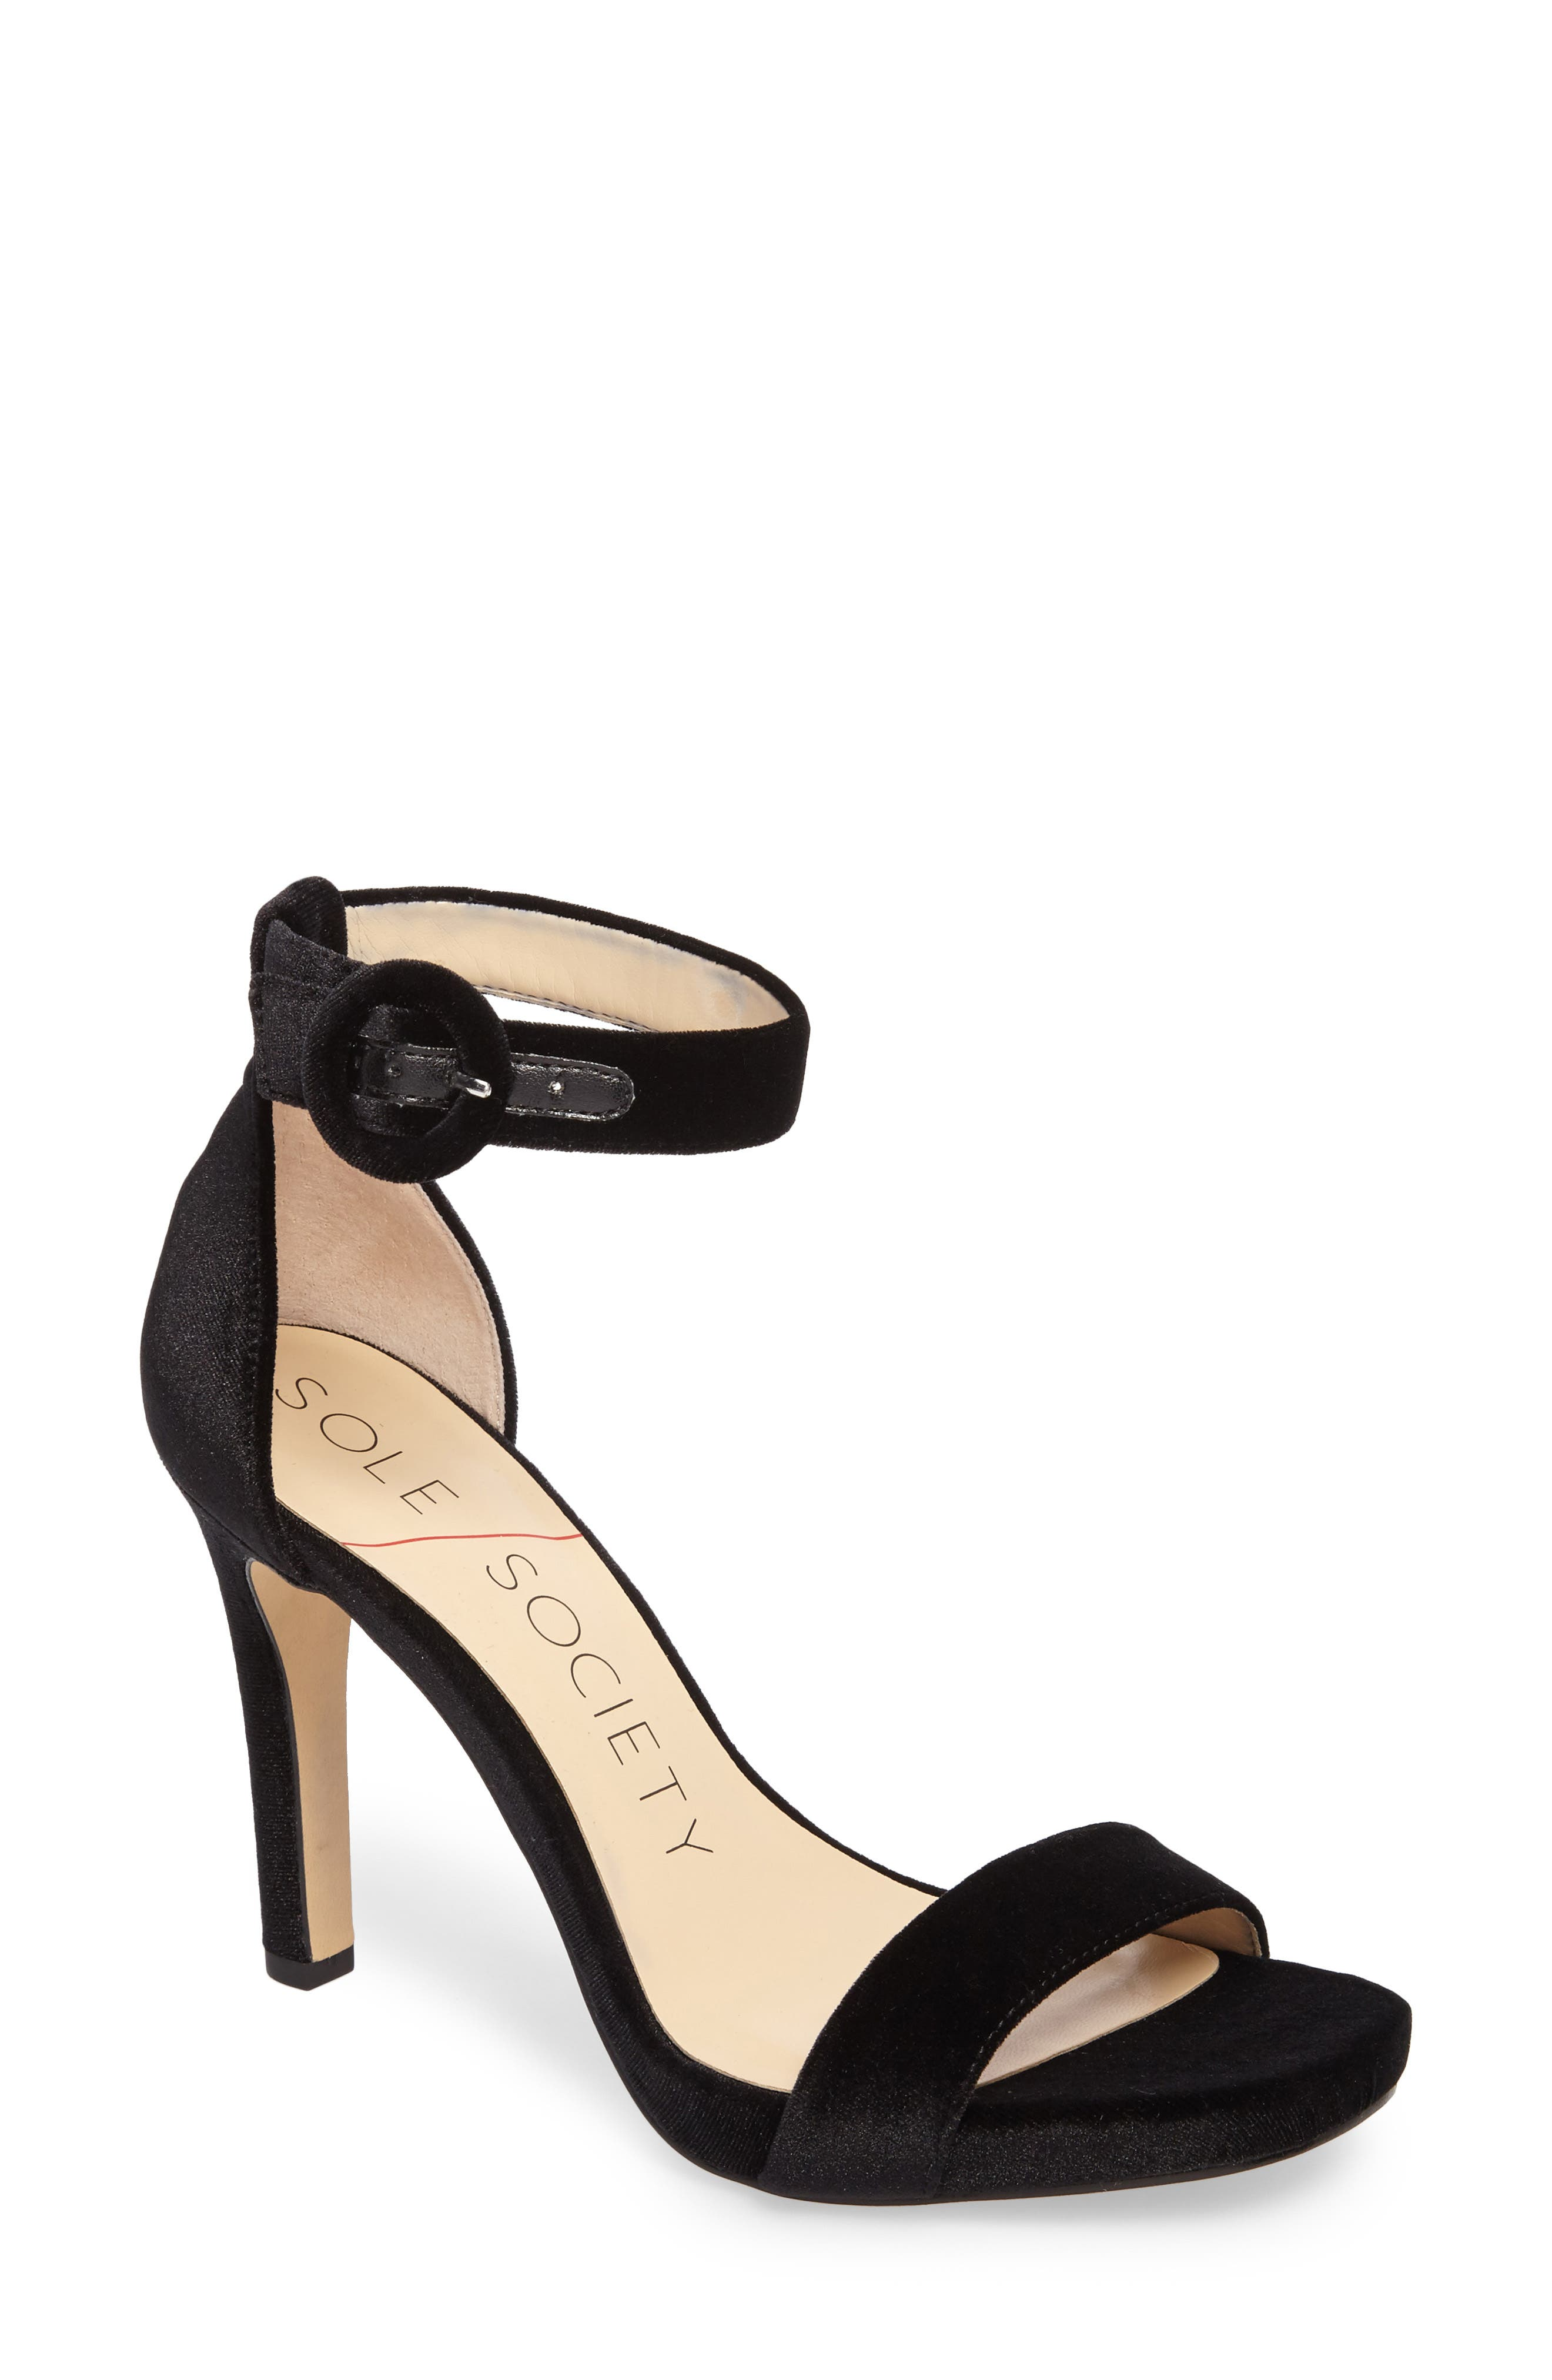 Emelia Ankle Strap Sandal,                             Main thumbnail 1, color,                             Black